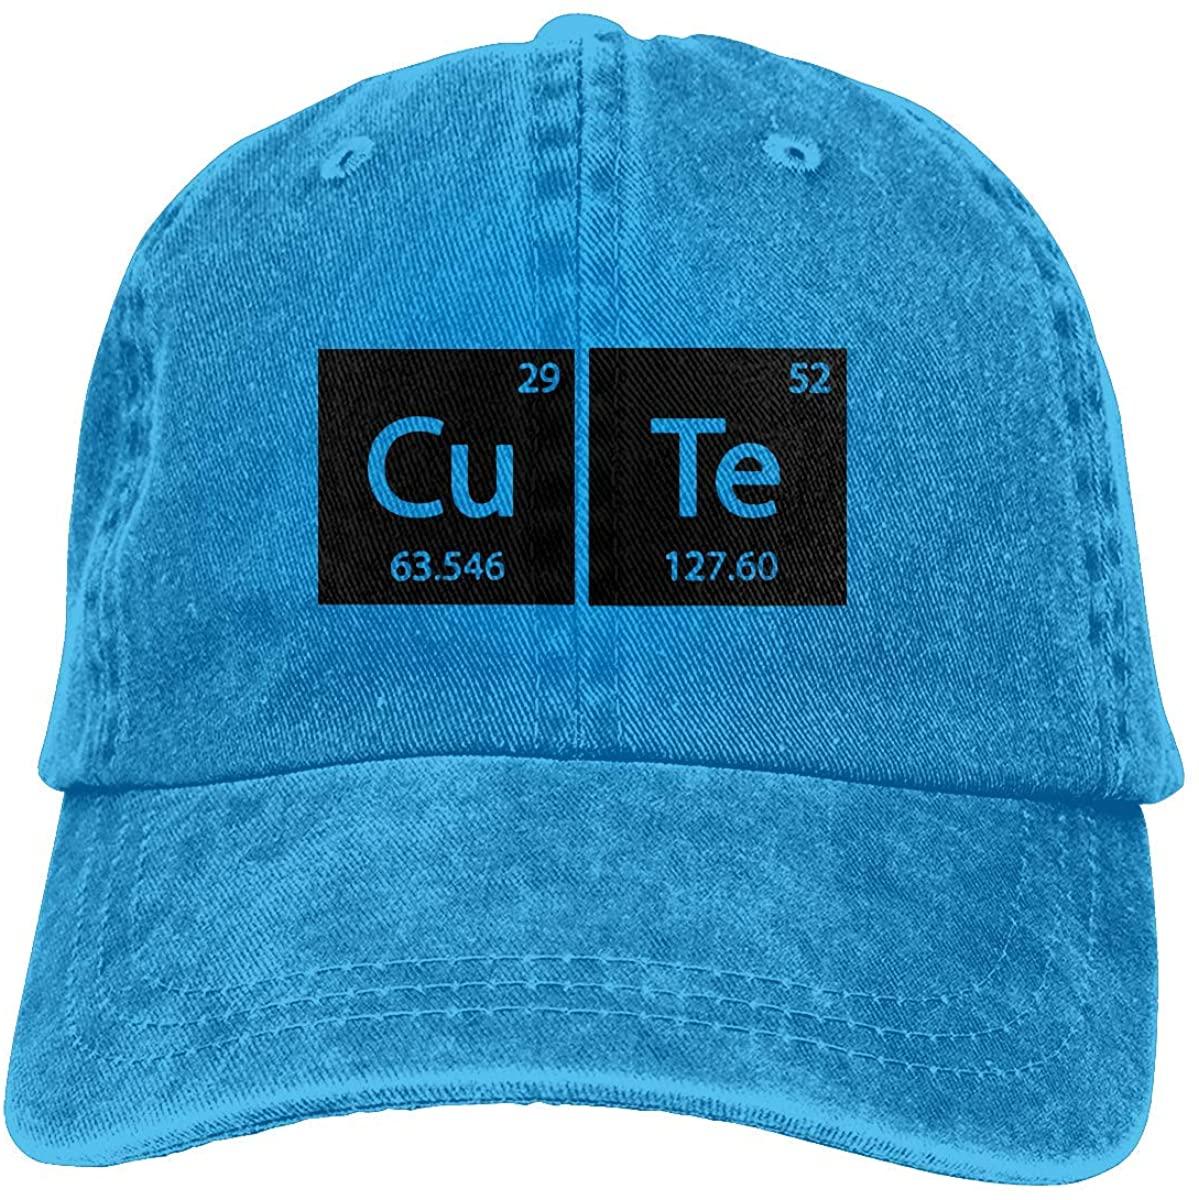 Women's Men's Adjustable Baseball Cap, Cute Chemistry Periodic Table Elements Denim Snapback Hip Hop Hats